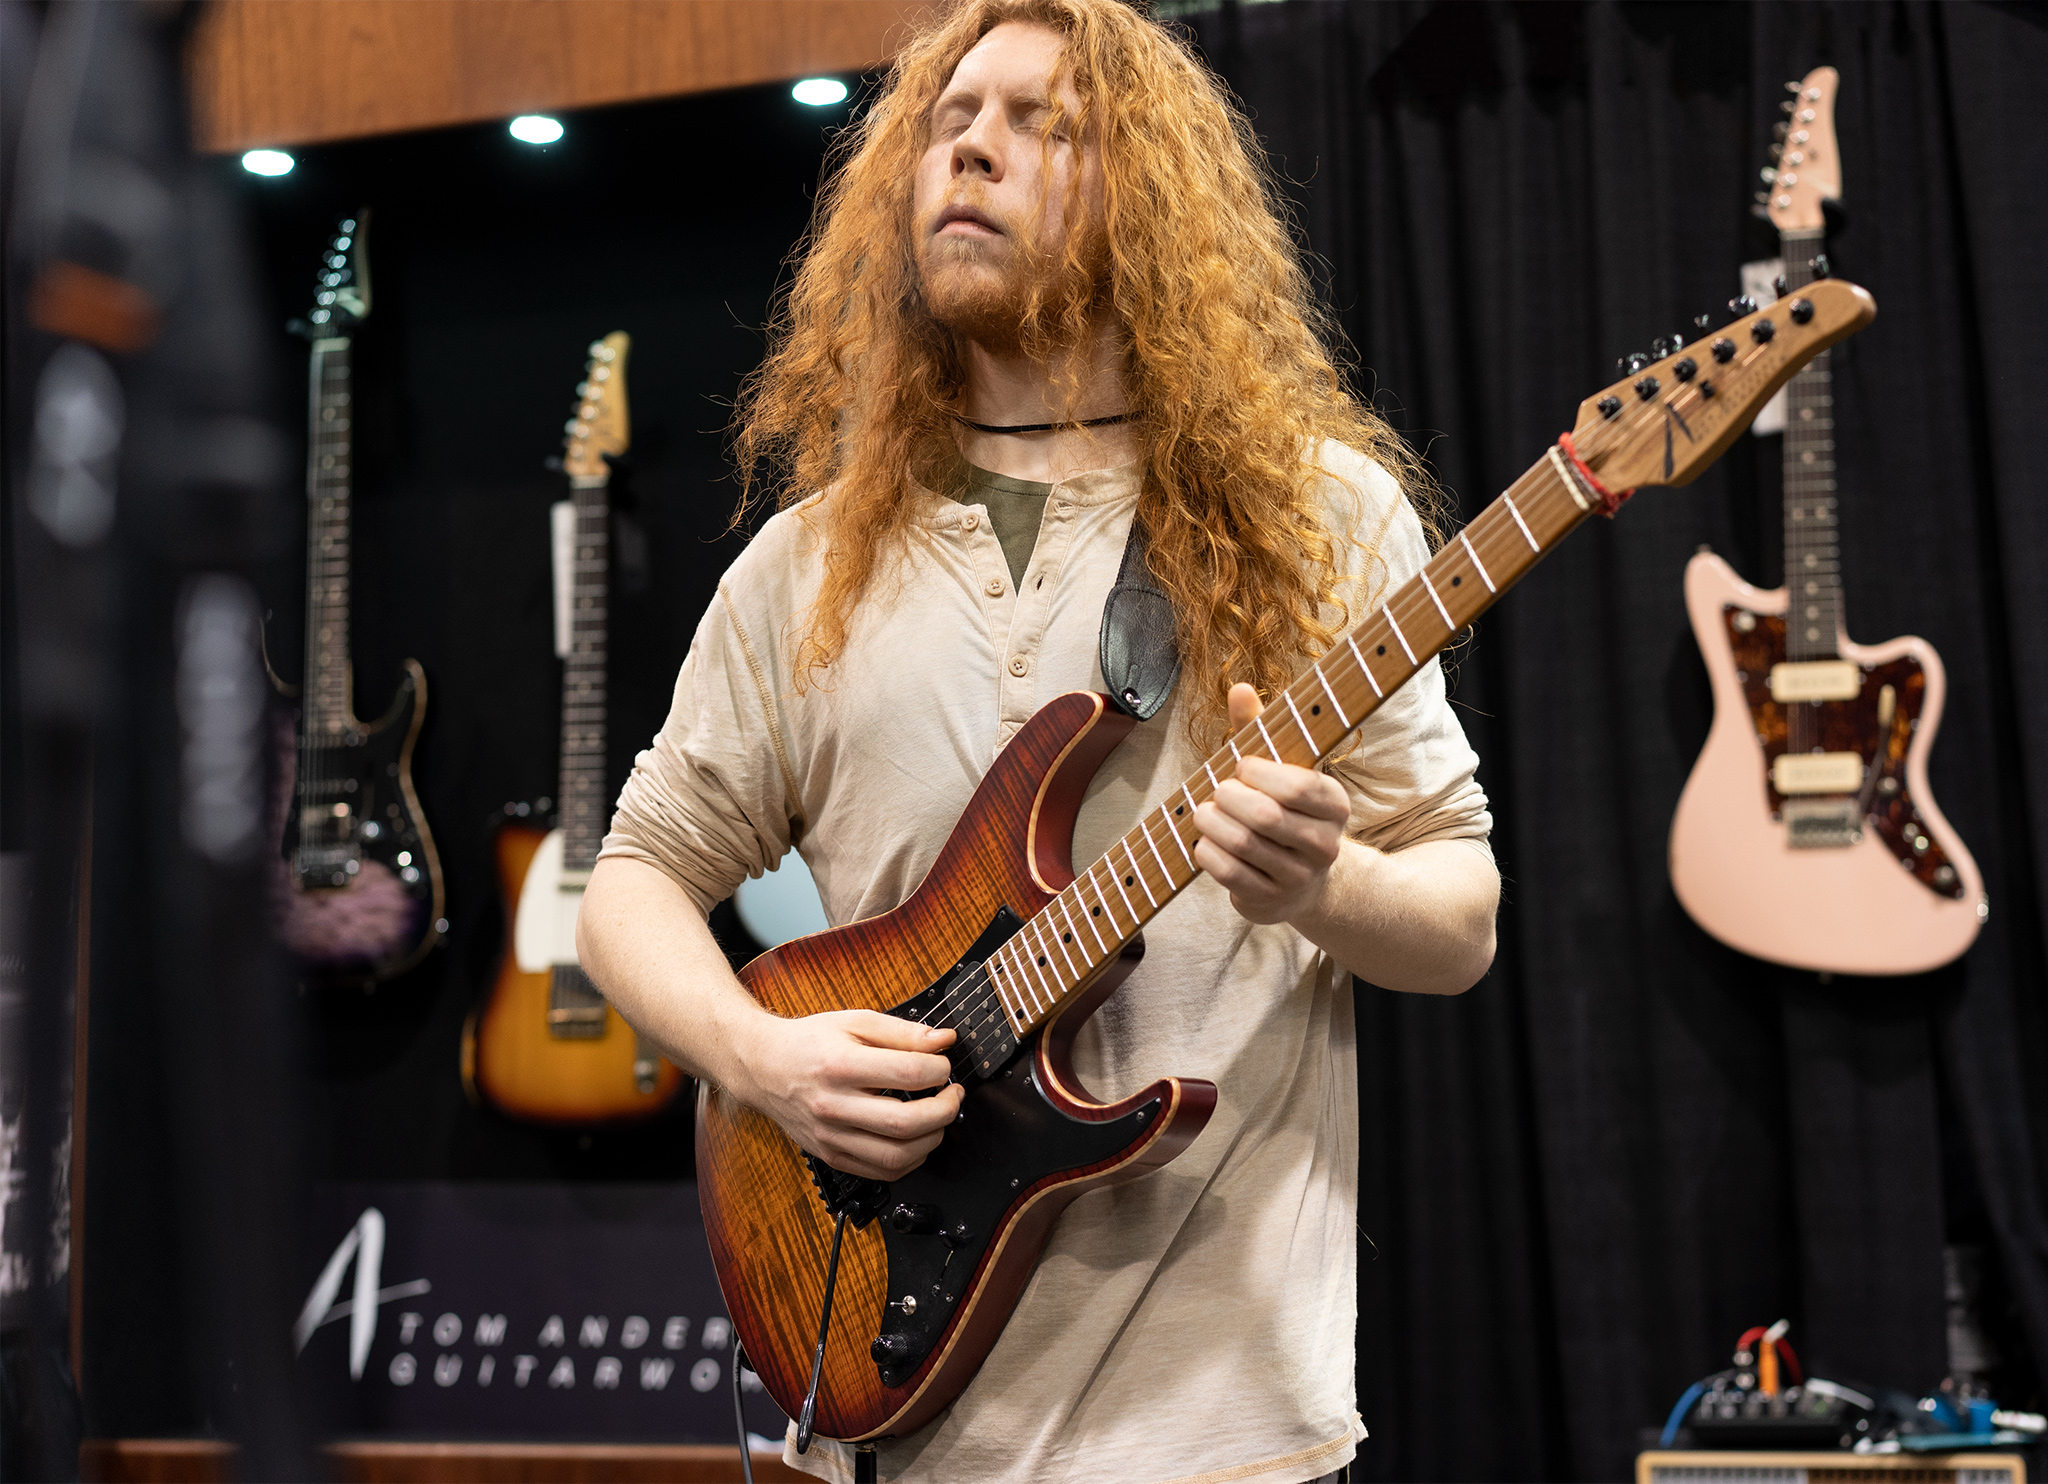 06-30-17S_Drop Top Classic_Satin Ginger Burst w Sean Ashe_3.jpg